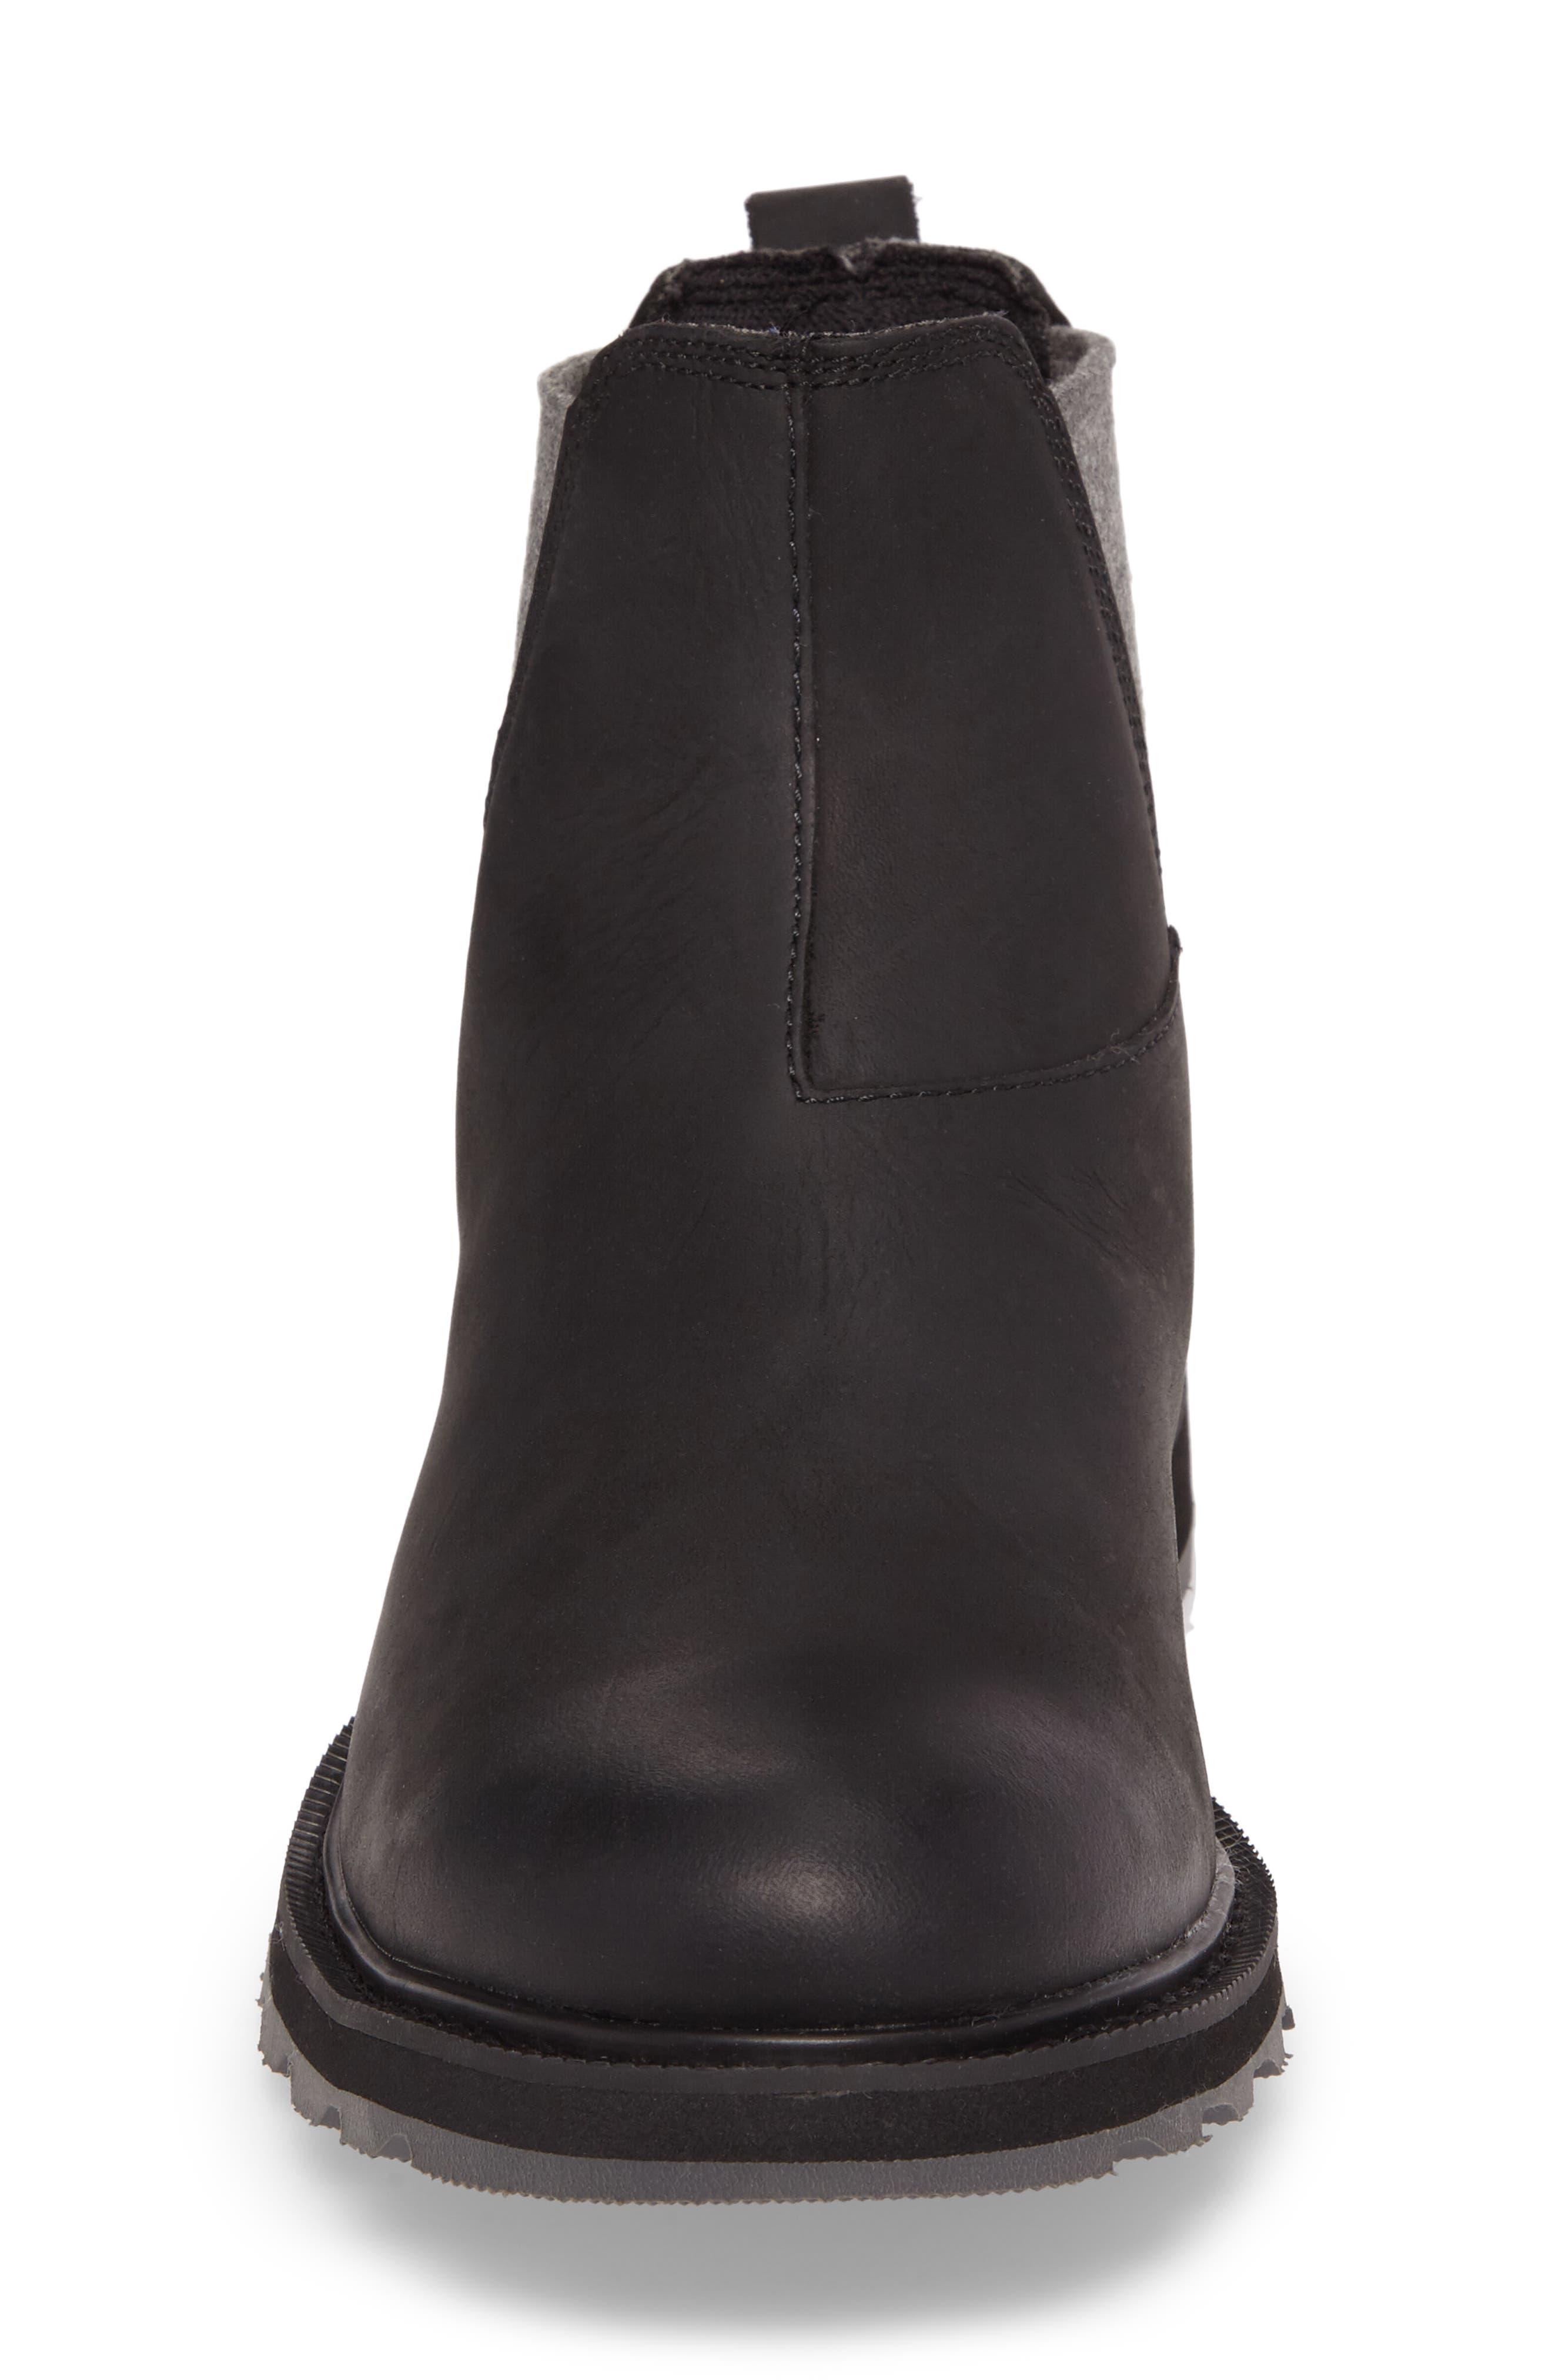 Madson Waterproof Chelsea Boot,                             Alternate thumbnail 4, color,                             Black